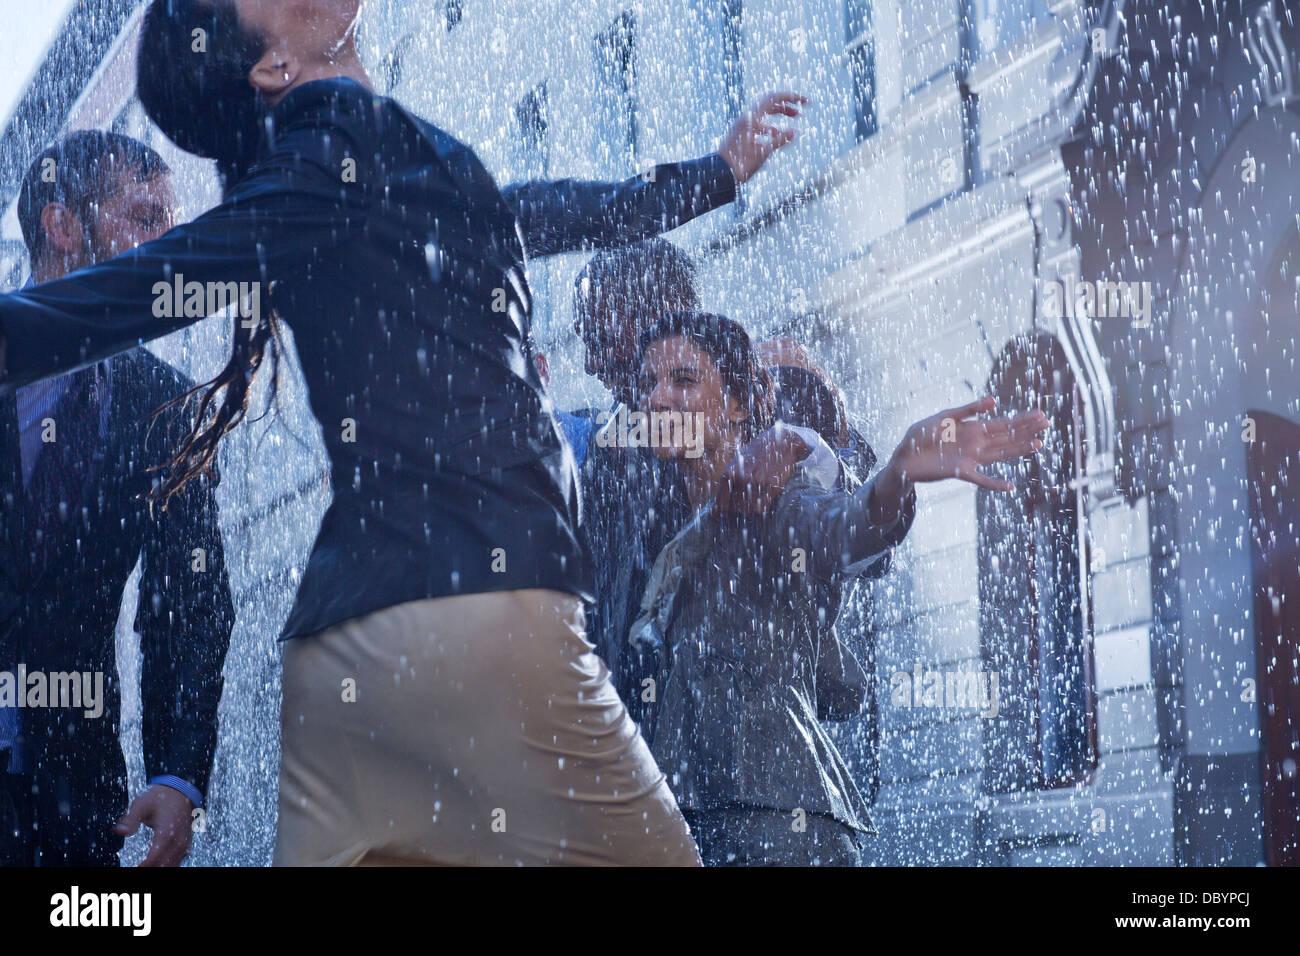 Business people dancing in rain - Stock Image